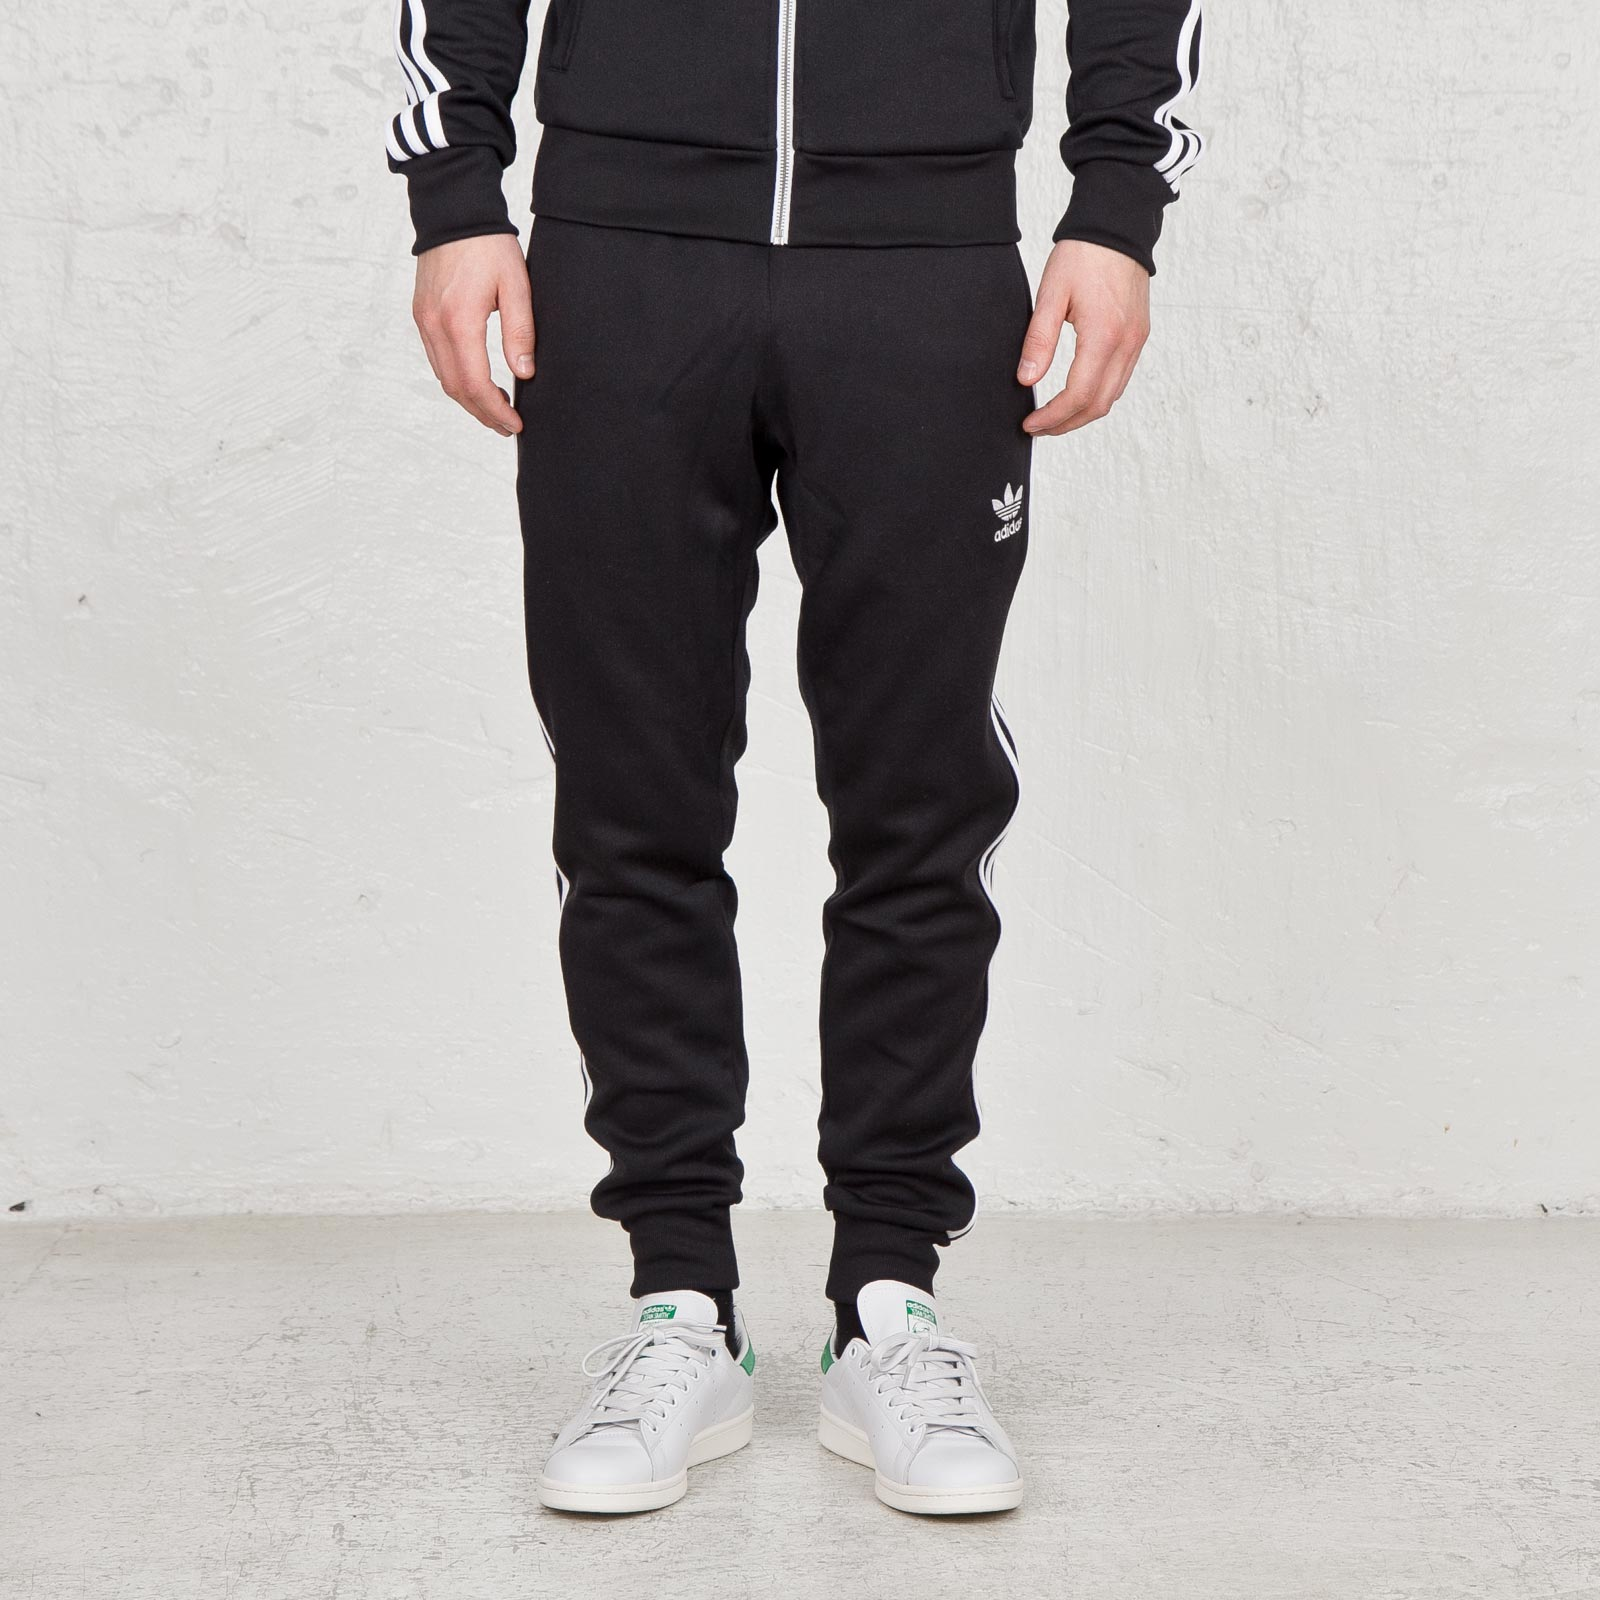 Adidas Superstar esposado TRACK PANT s89369 sneakersnstuff